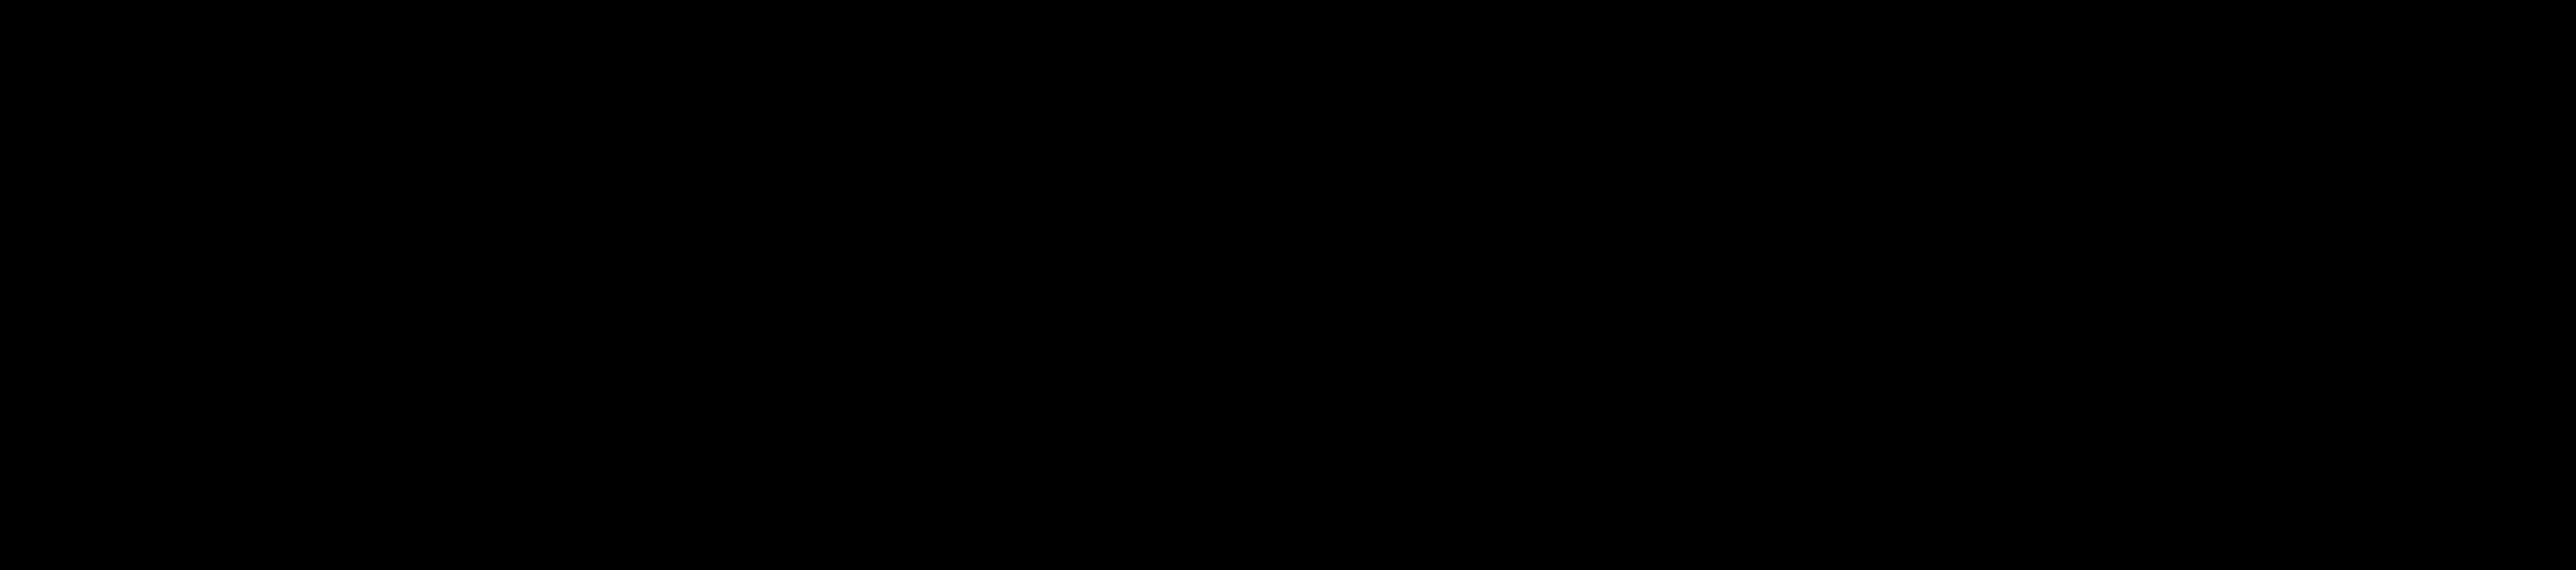 rg-sig-logo-black@hd.png